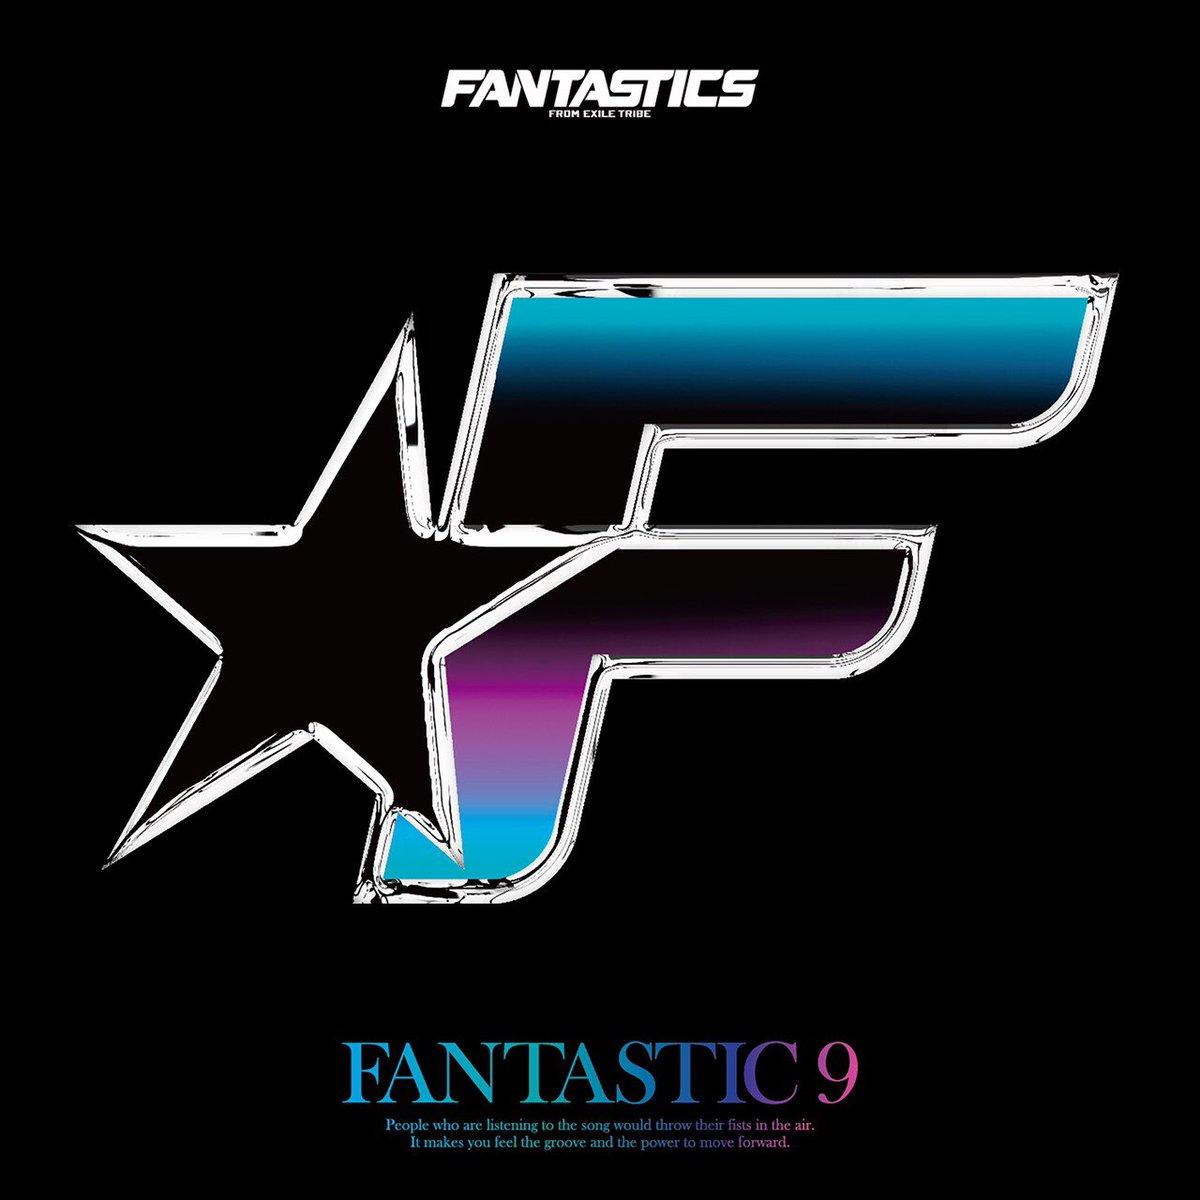 FANTASTICS 1stアルバム「FANTASTIC 9」2020/2/12 (水) release!!FANTASTICSメンバーがアルバムの解説をしています👀🌟✔︎第1弾✔︎第2弾✔︎第3弾ぜひ!!!ご覧下さい😊#FANTASTIC9#FANTASTICS